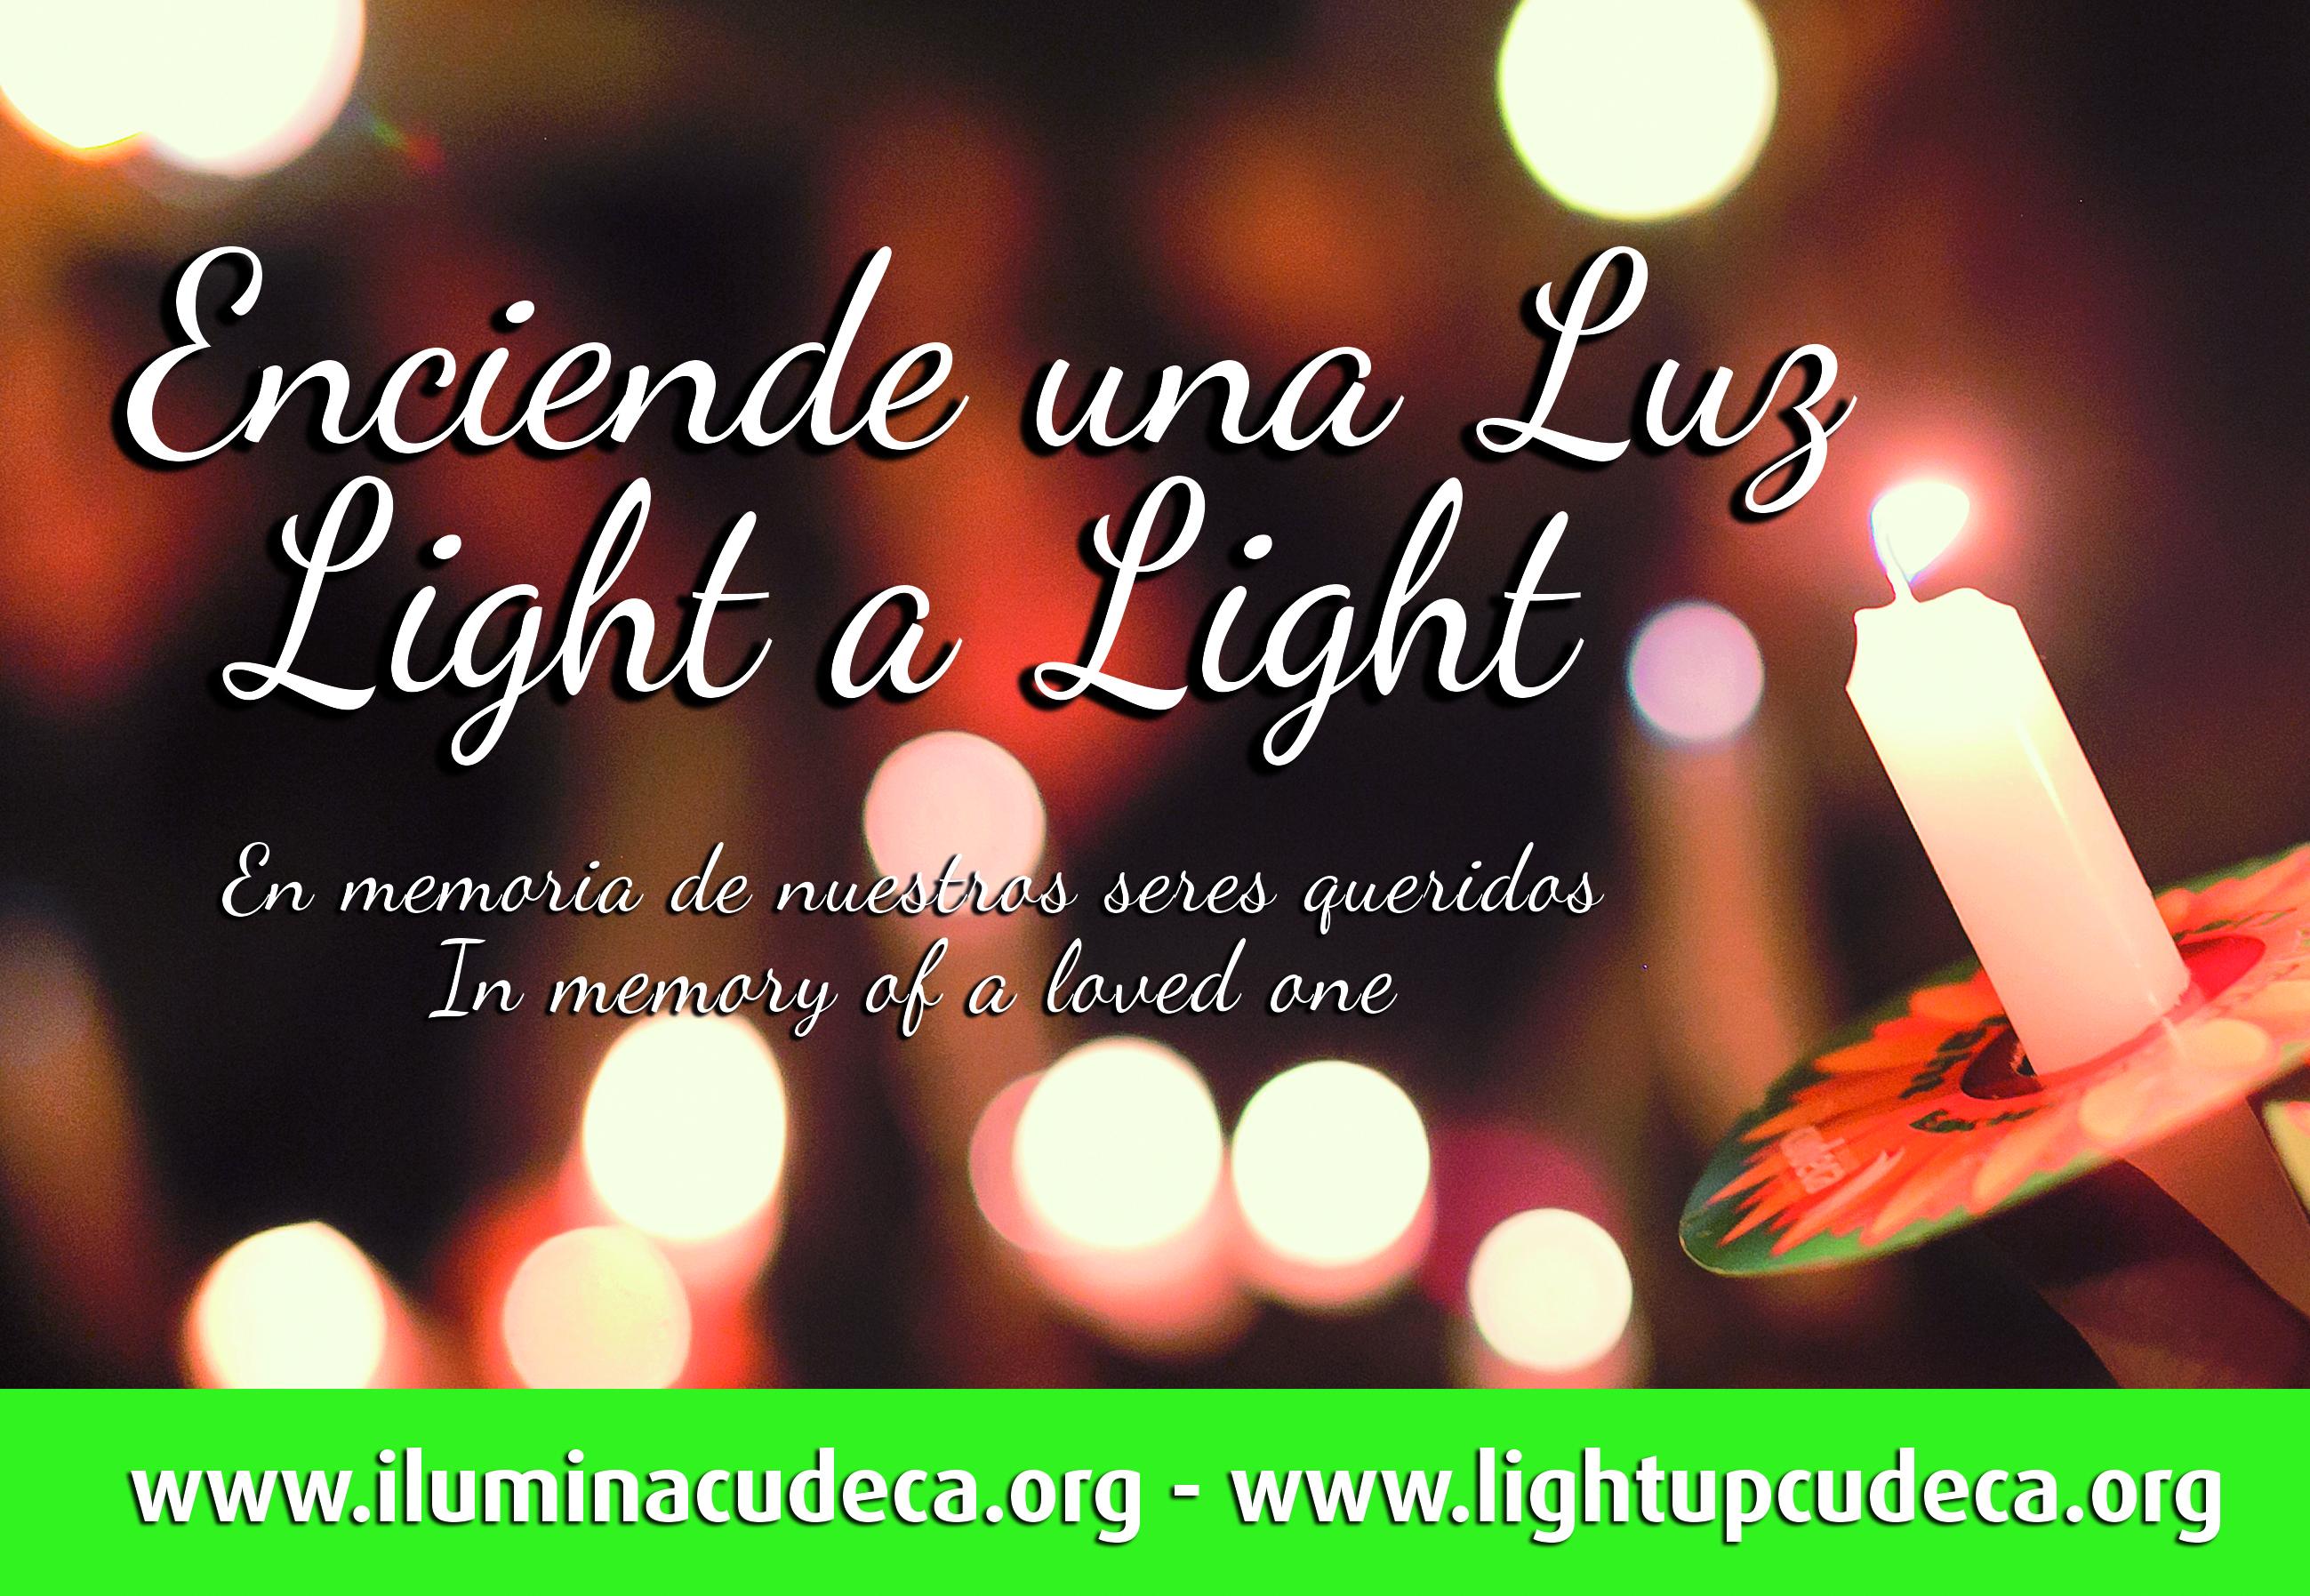 Foto campaña Light a Light